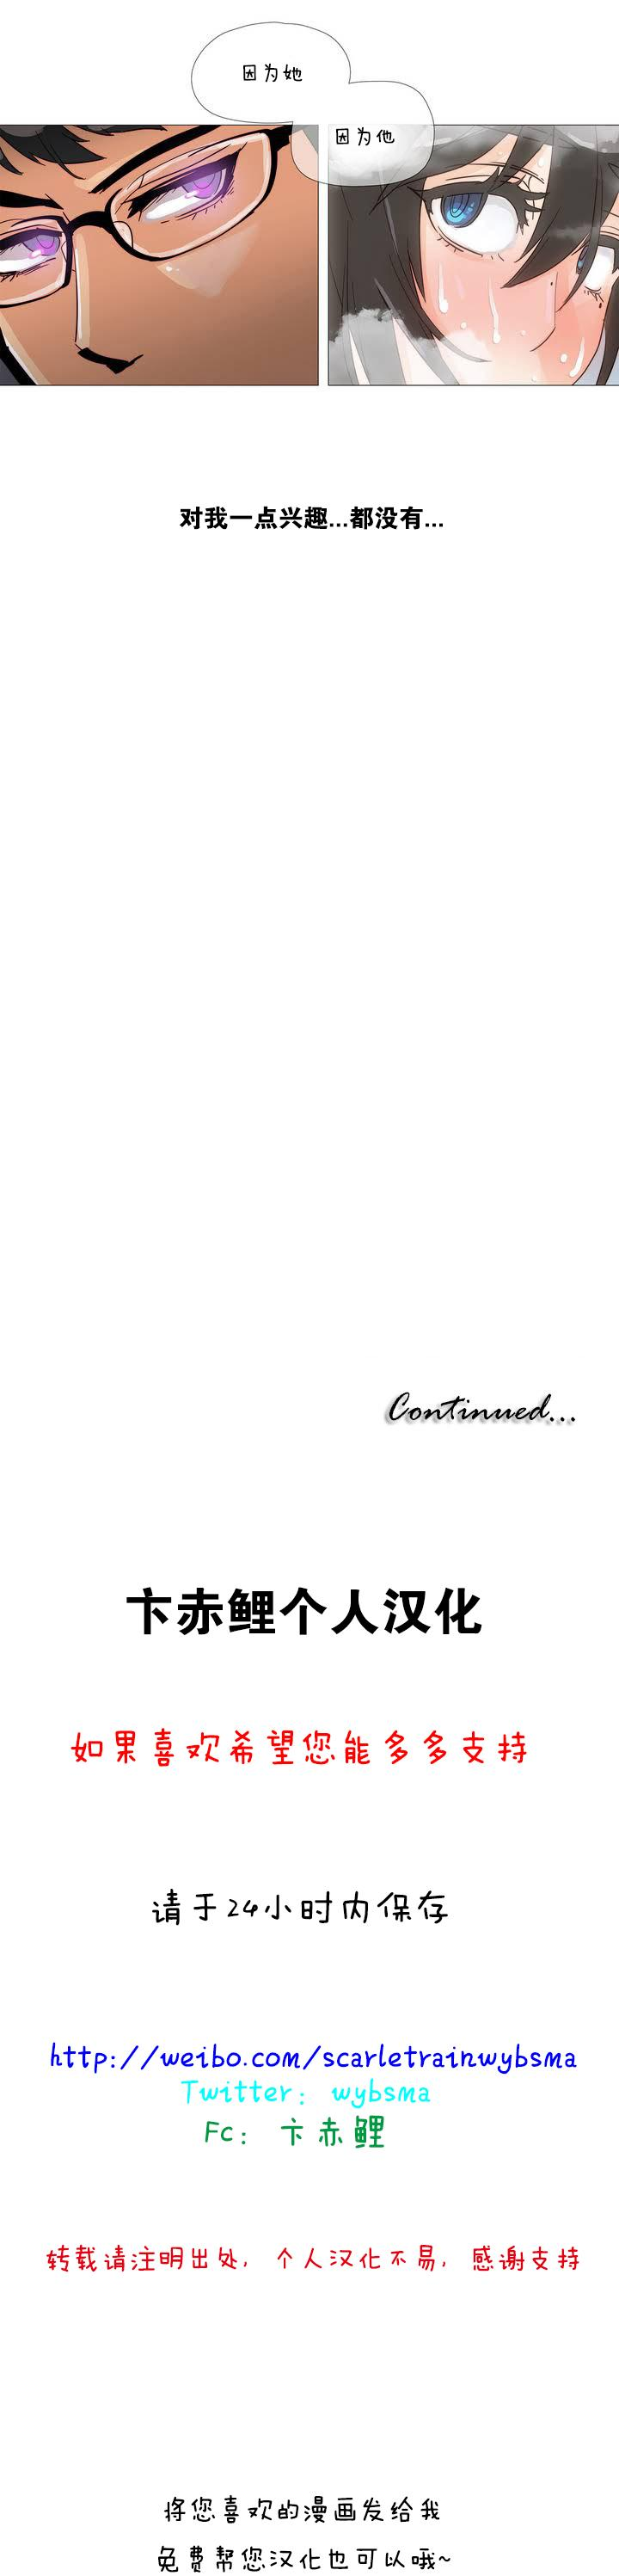 HouseHold Affairs 【卞赤鲤个人汉化】1~33话(持续更新中) 16